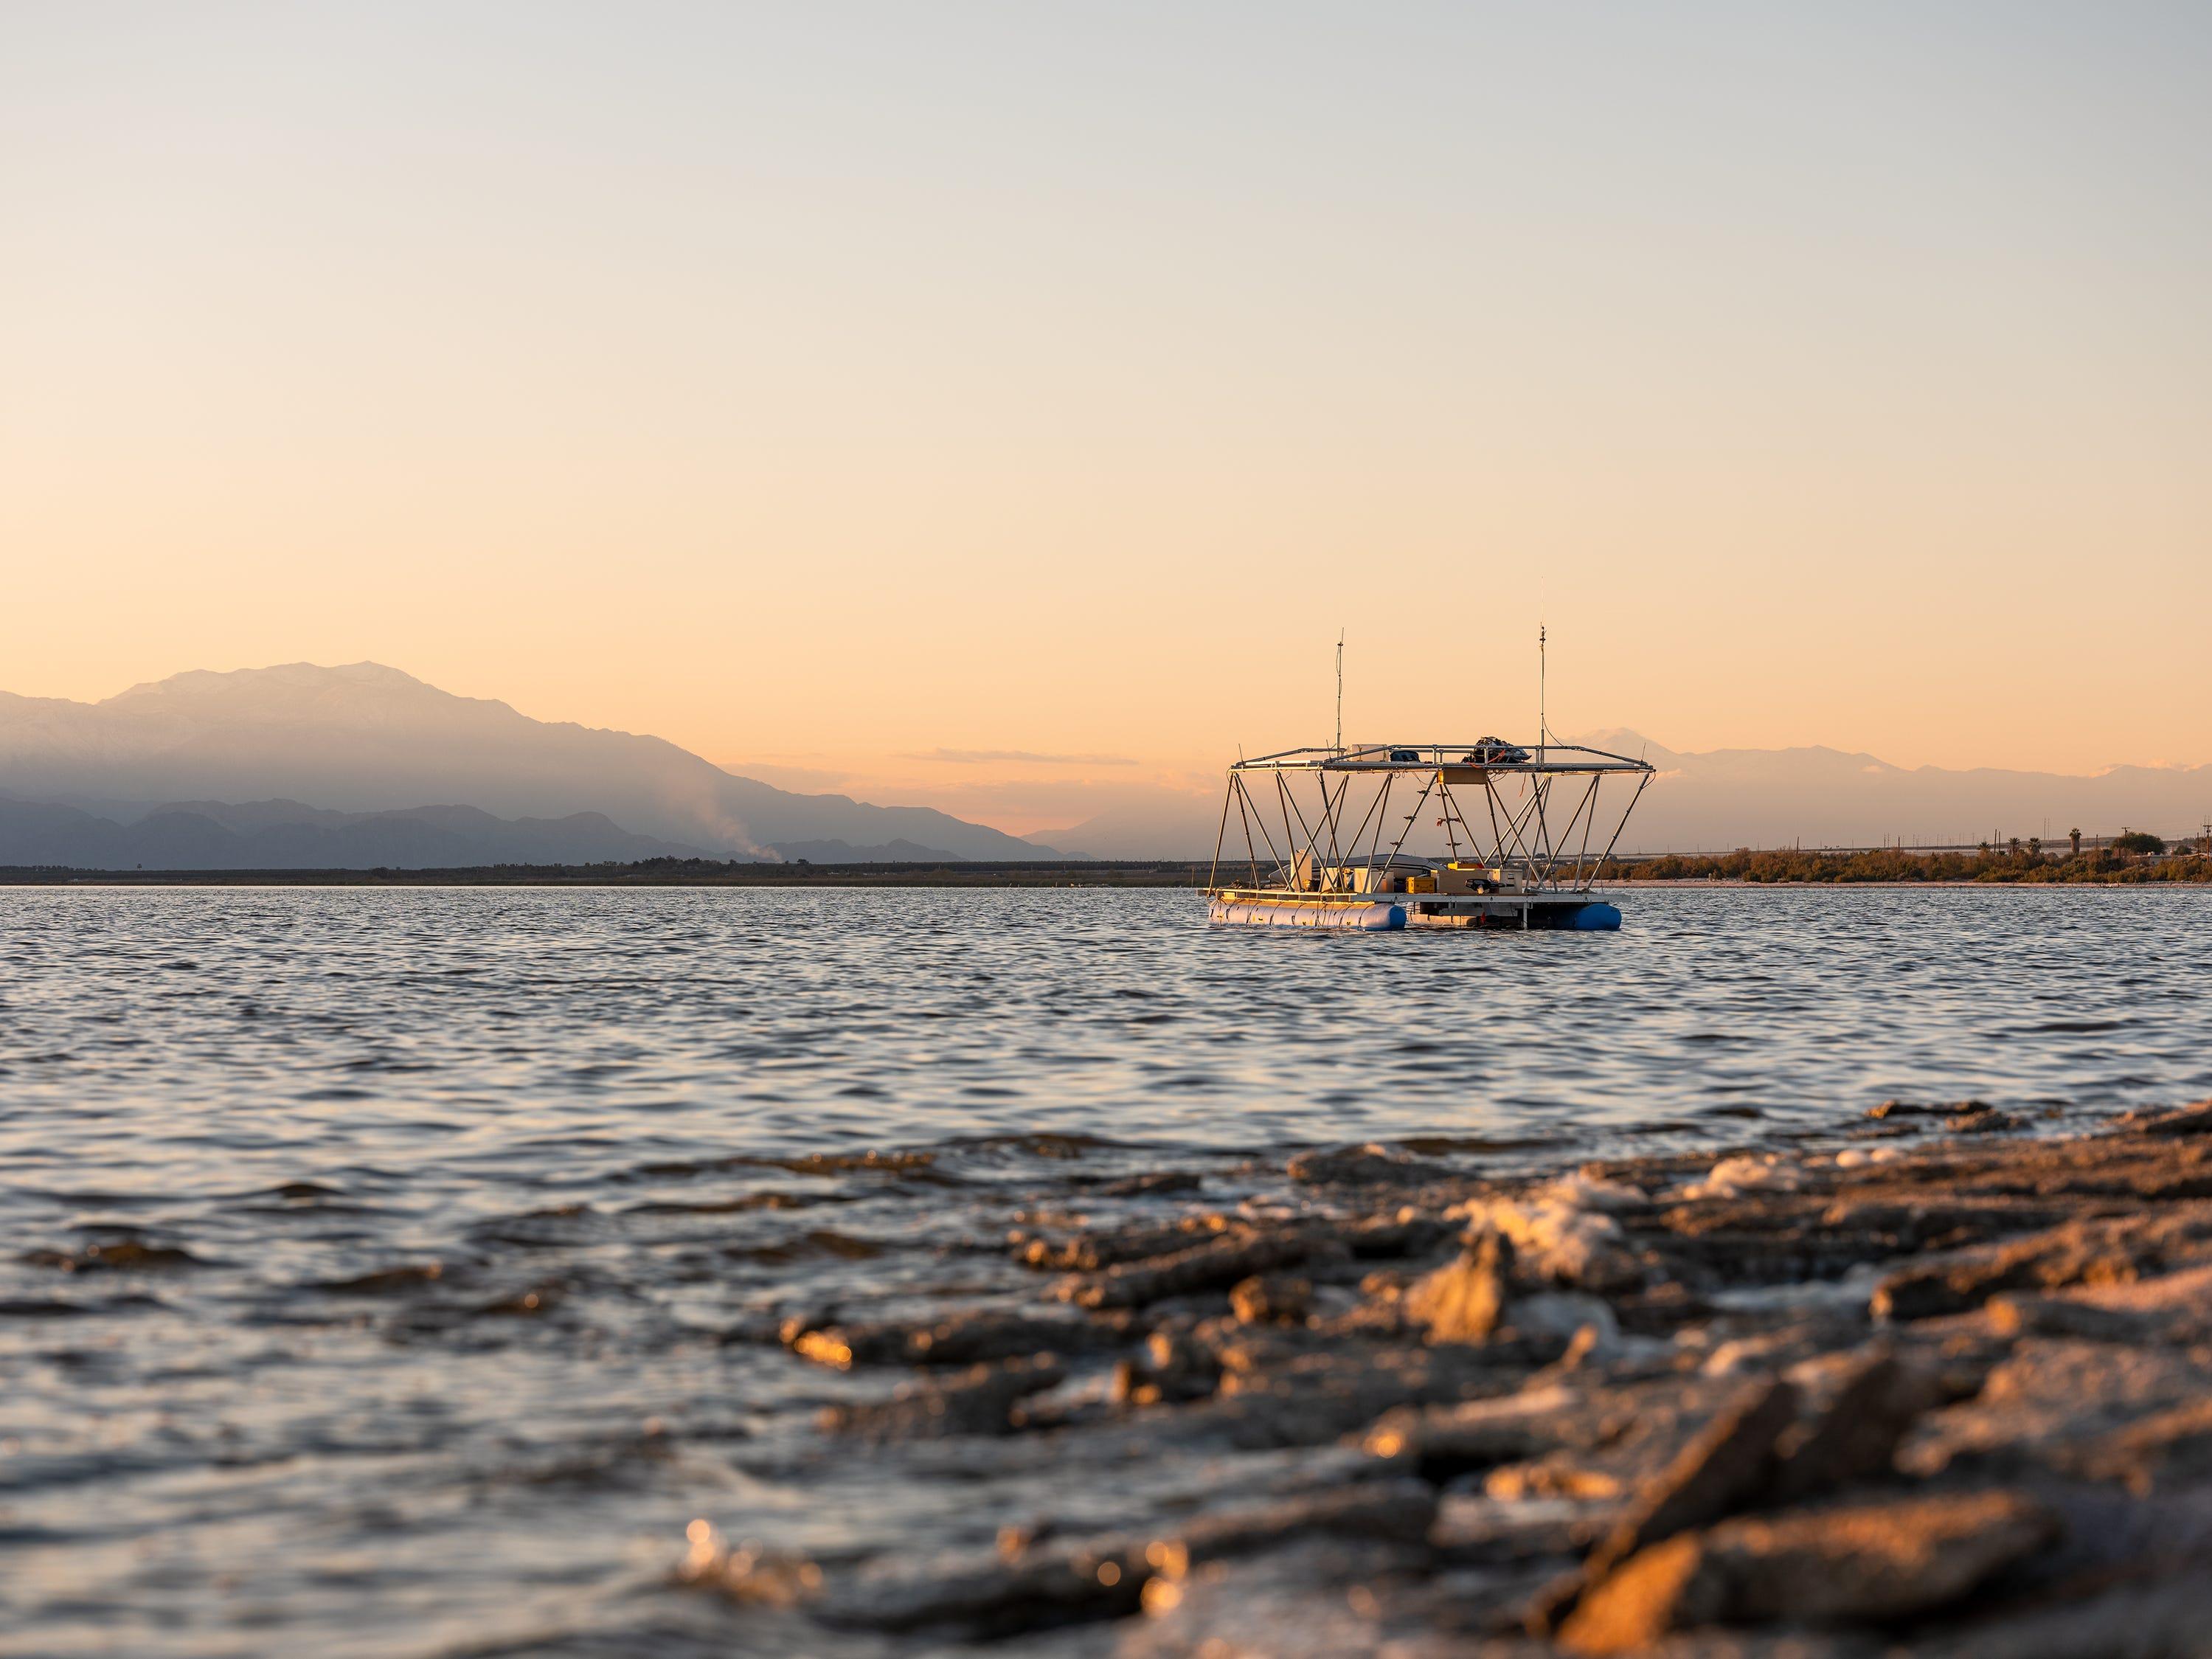 """Terminal Lake Exploration Platform"" by Chris Taylor and Steve Badgett at Desert X 2019"